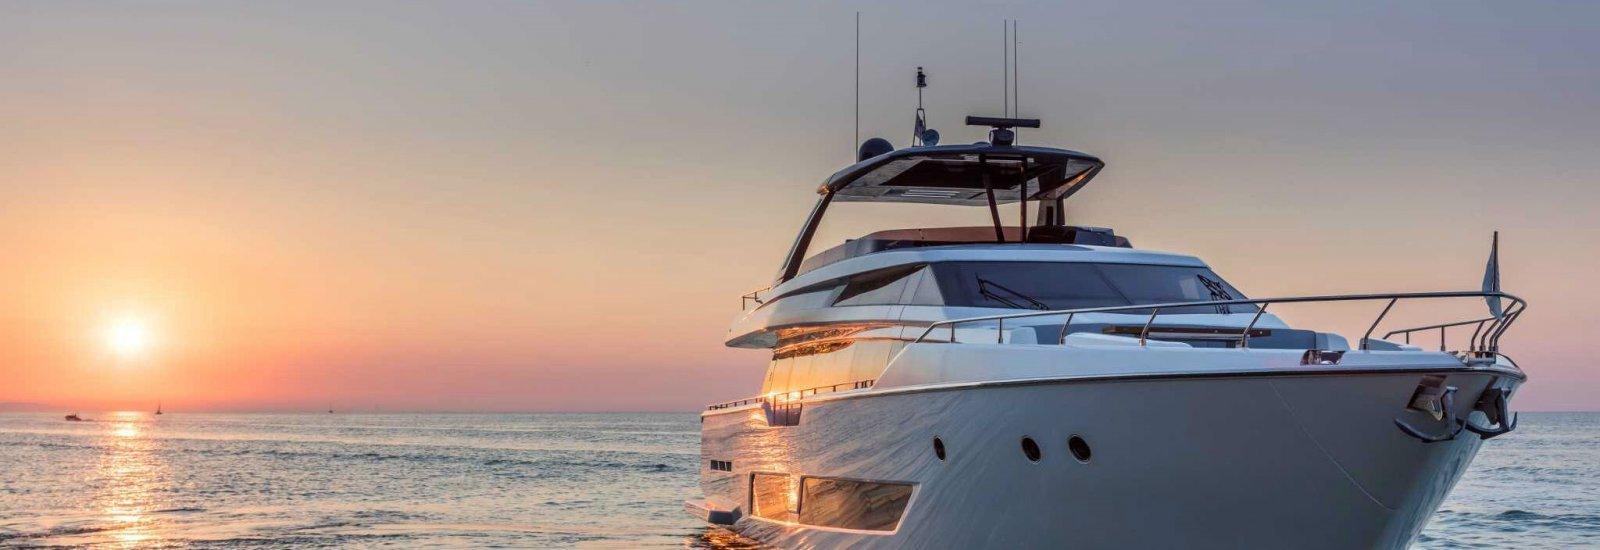 bateaux neufs ferretti group JMA Yachting Port Fréjus Var vente location neuf occasion